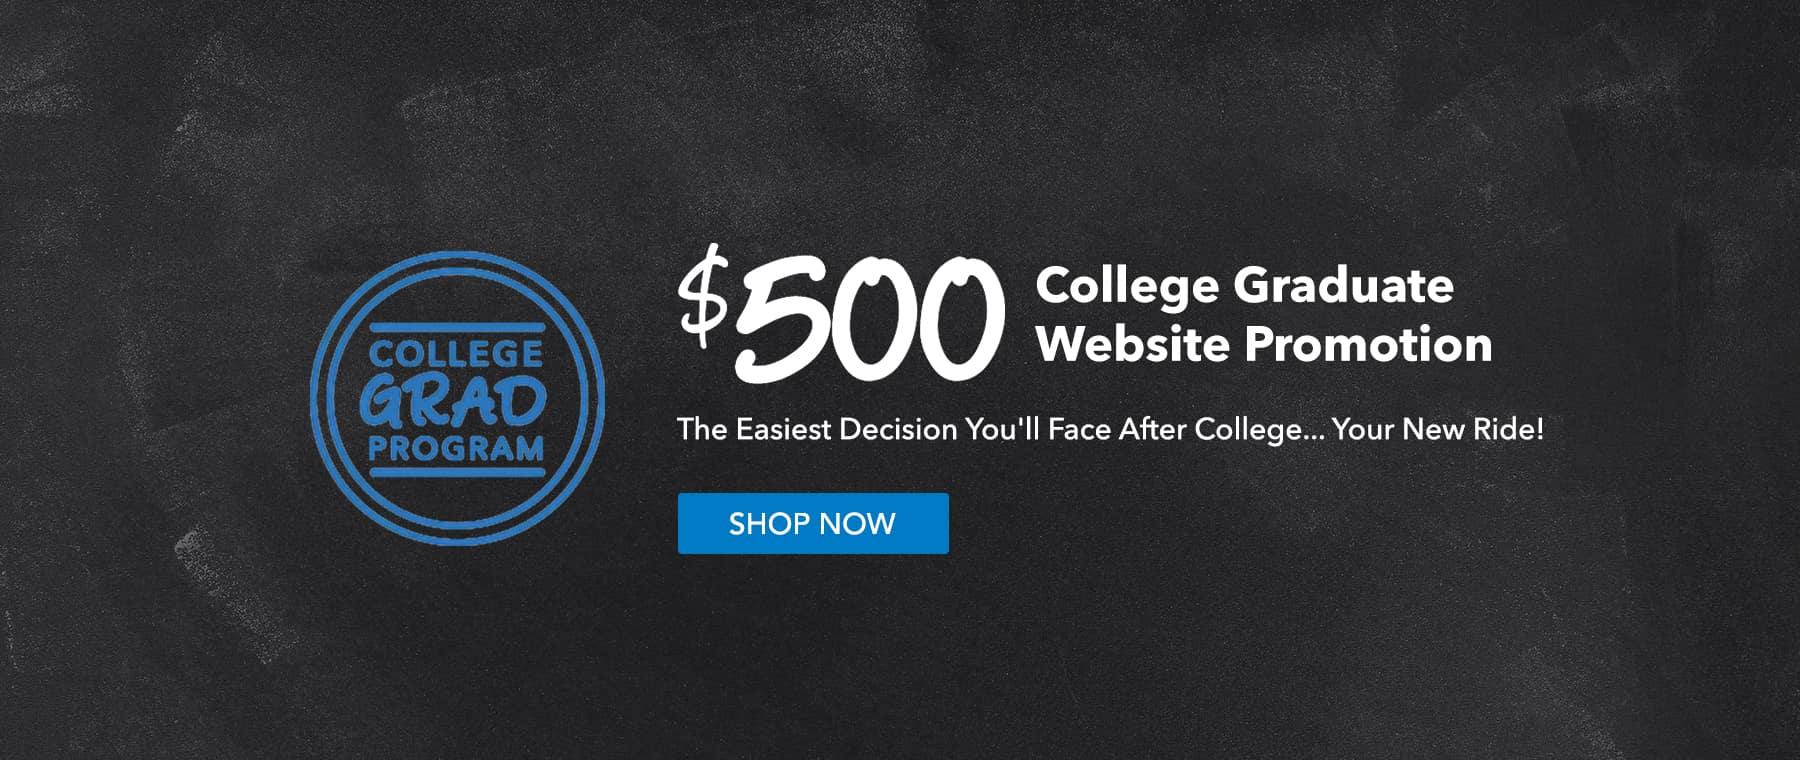 College Graduate Promo